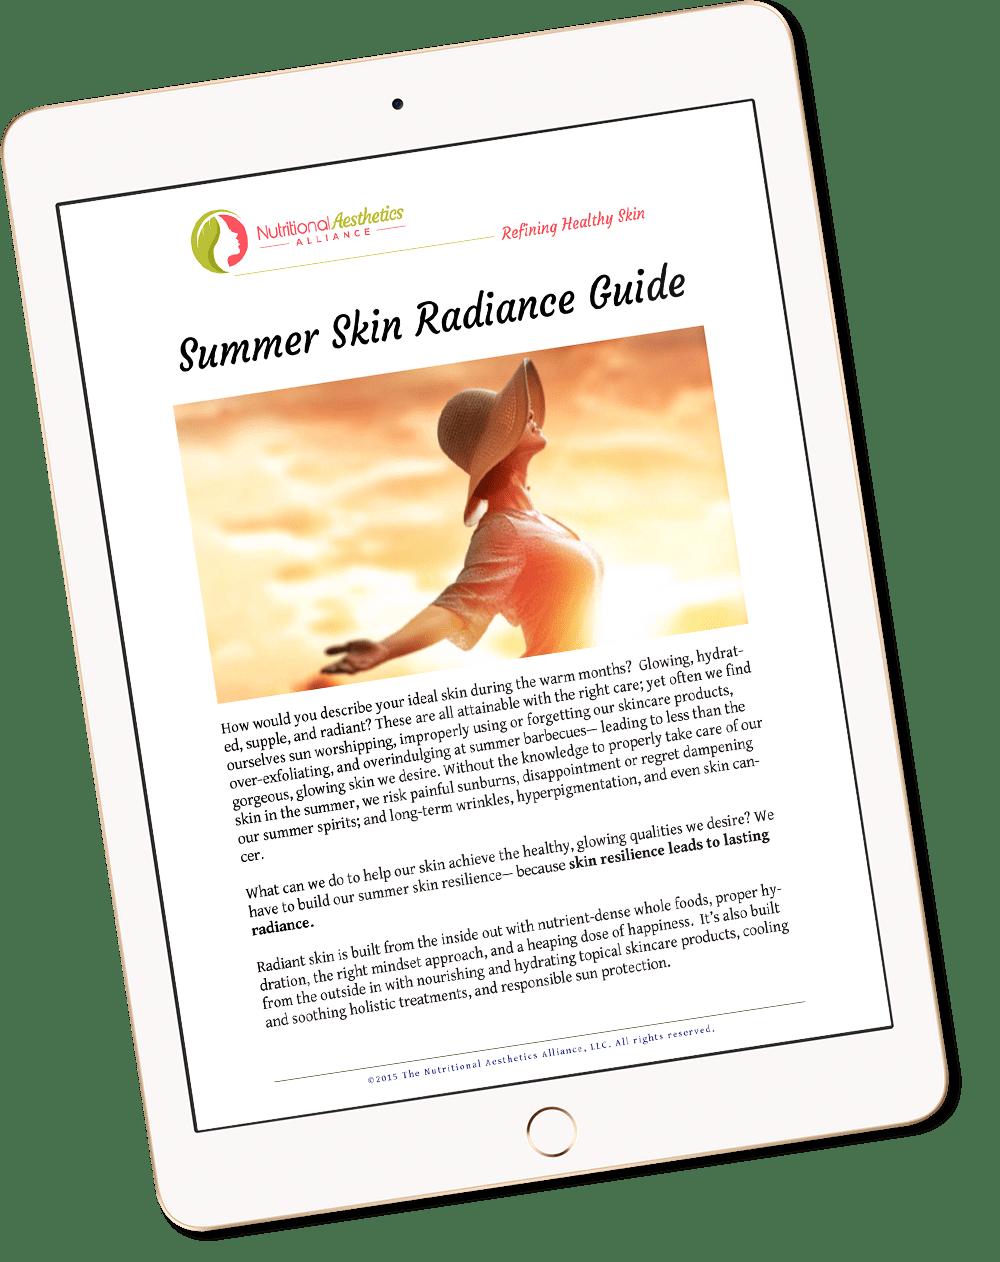 Summer Guide on iPad